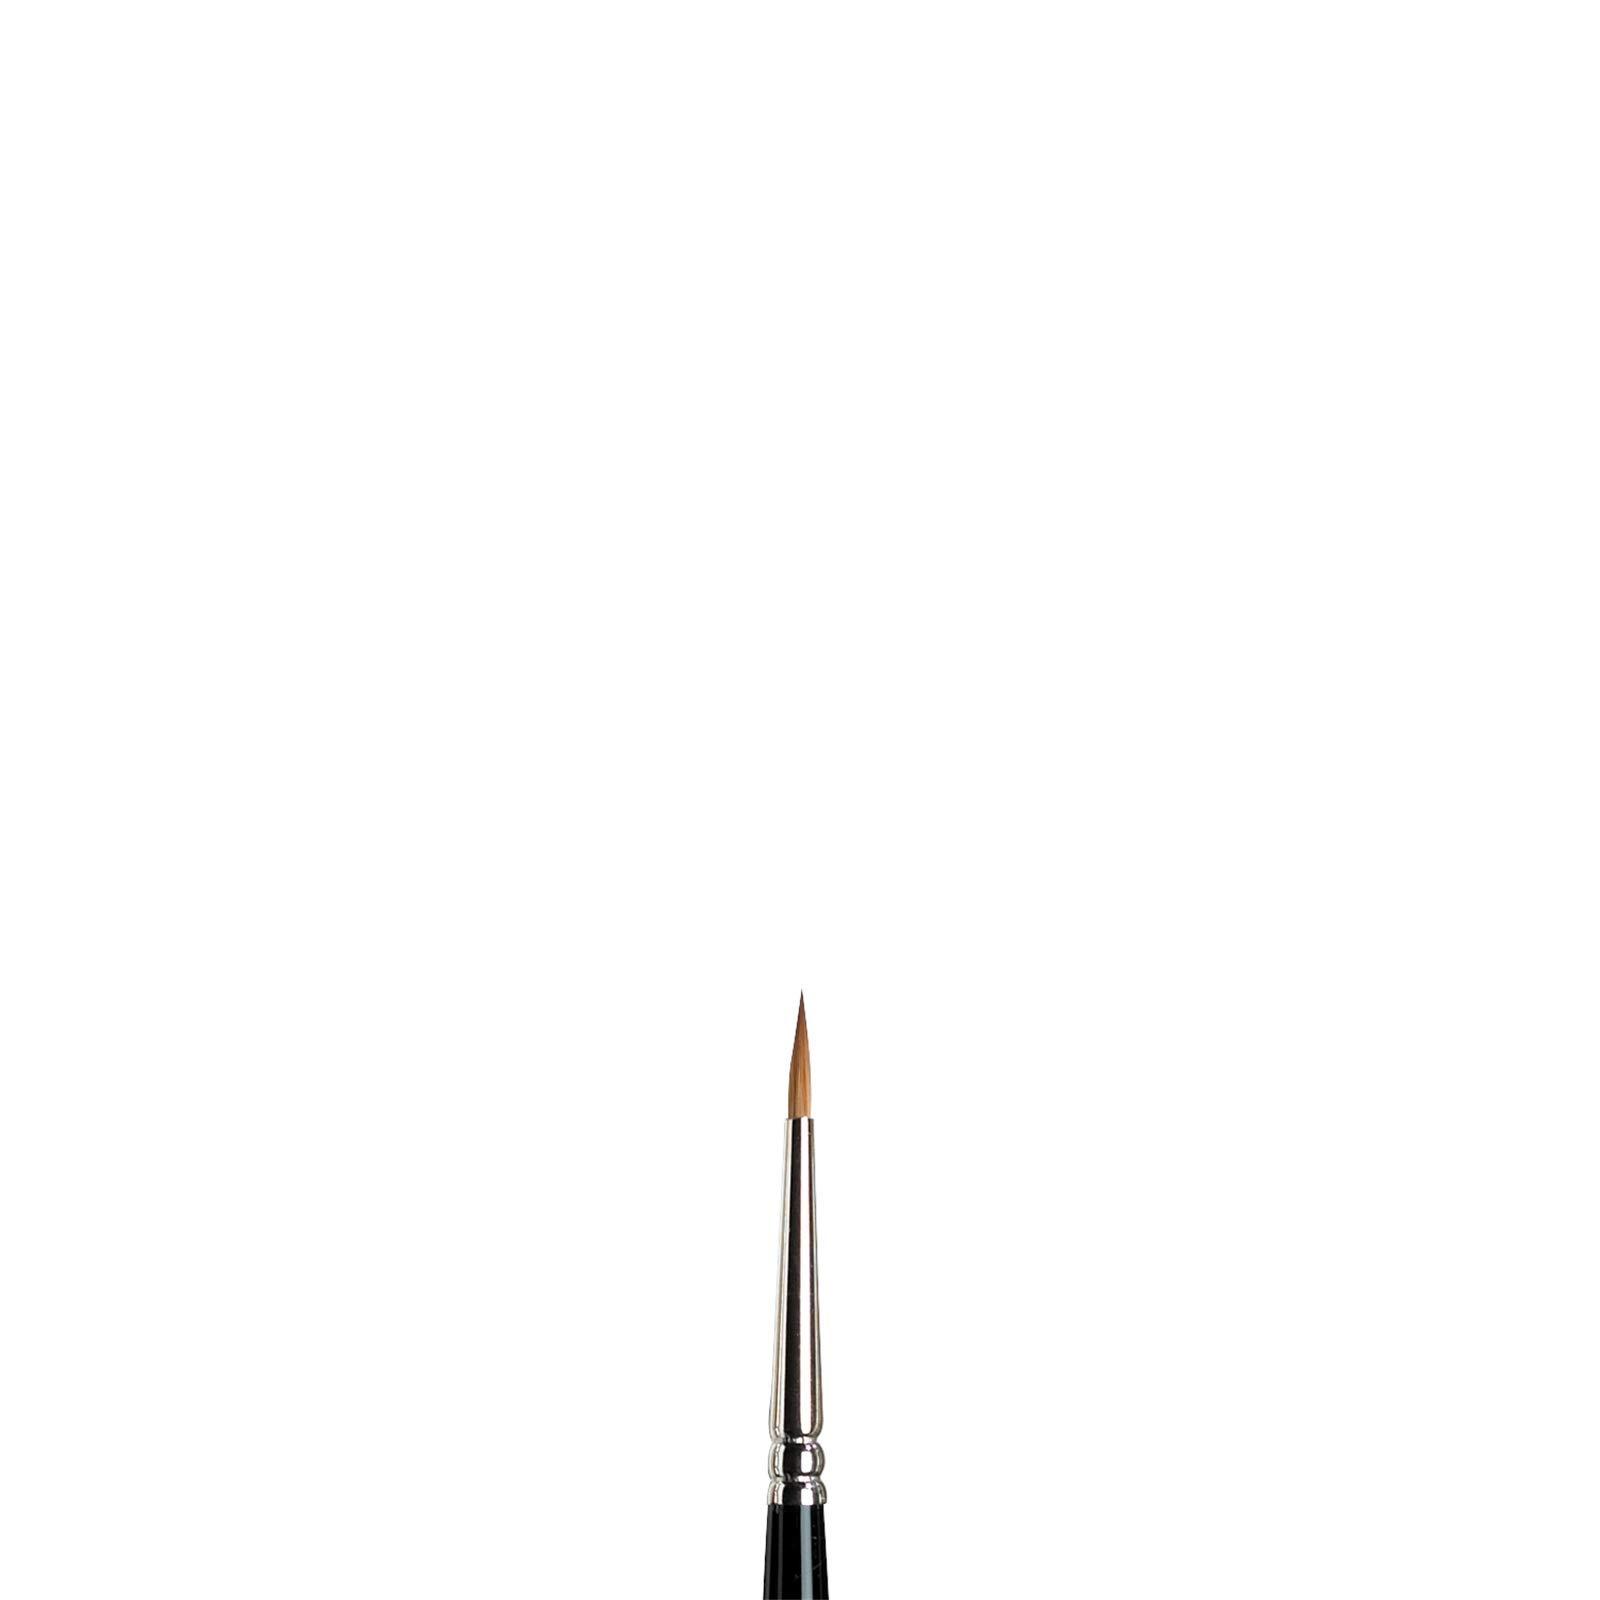 Winsor & Newton Series 7 Kolinsky Sable Watercolor Brush - Round #1 (5007001) by Winsor & Newton